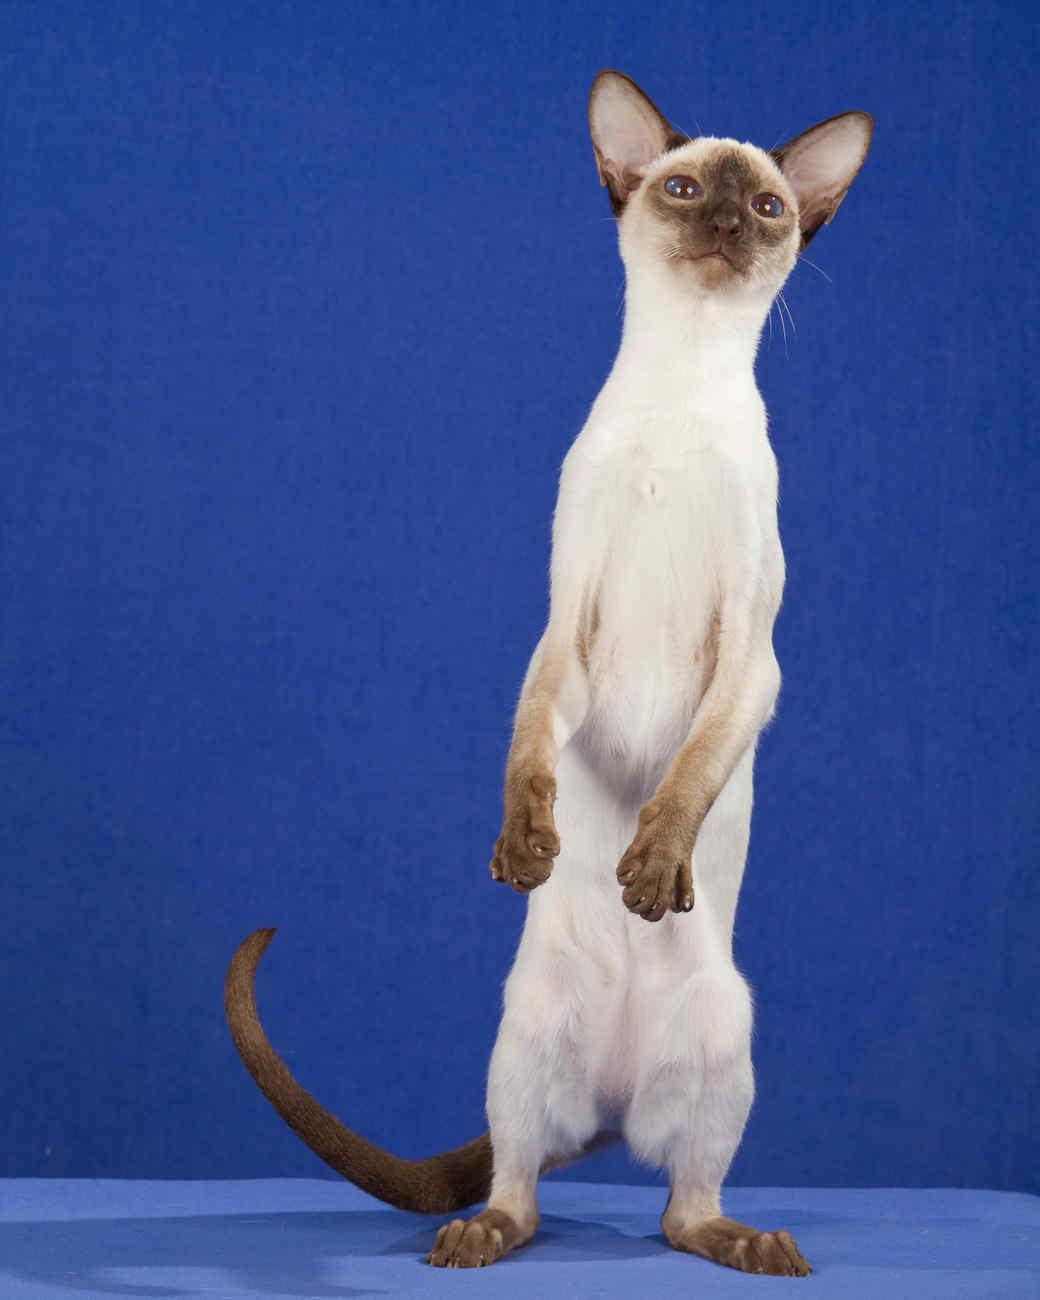 cat-breeds-siamese-mb06-144.jpg